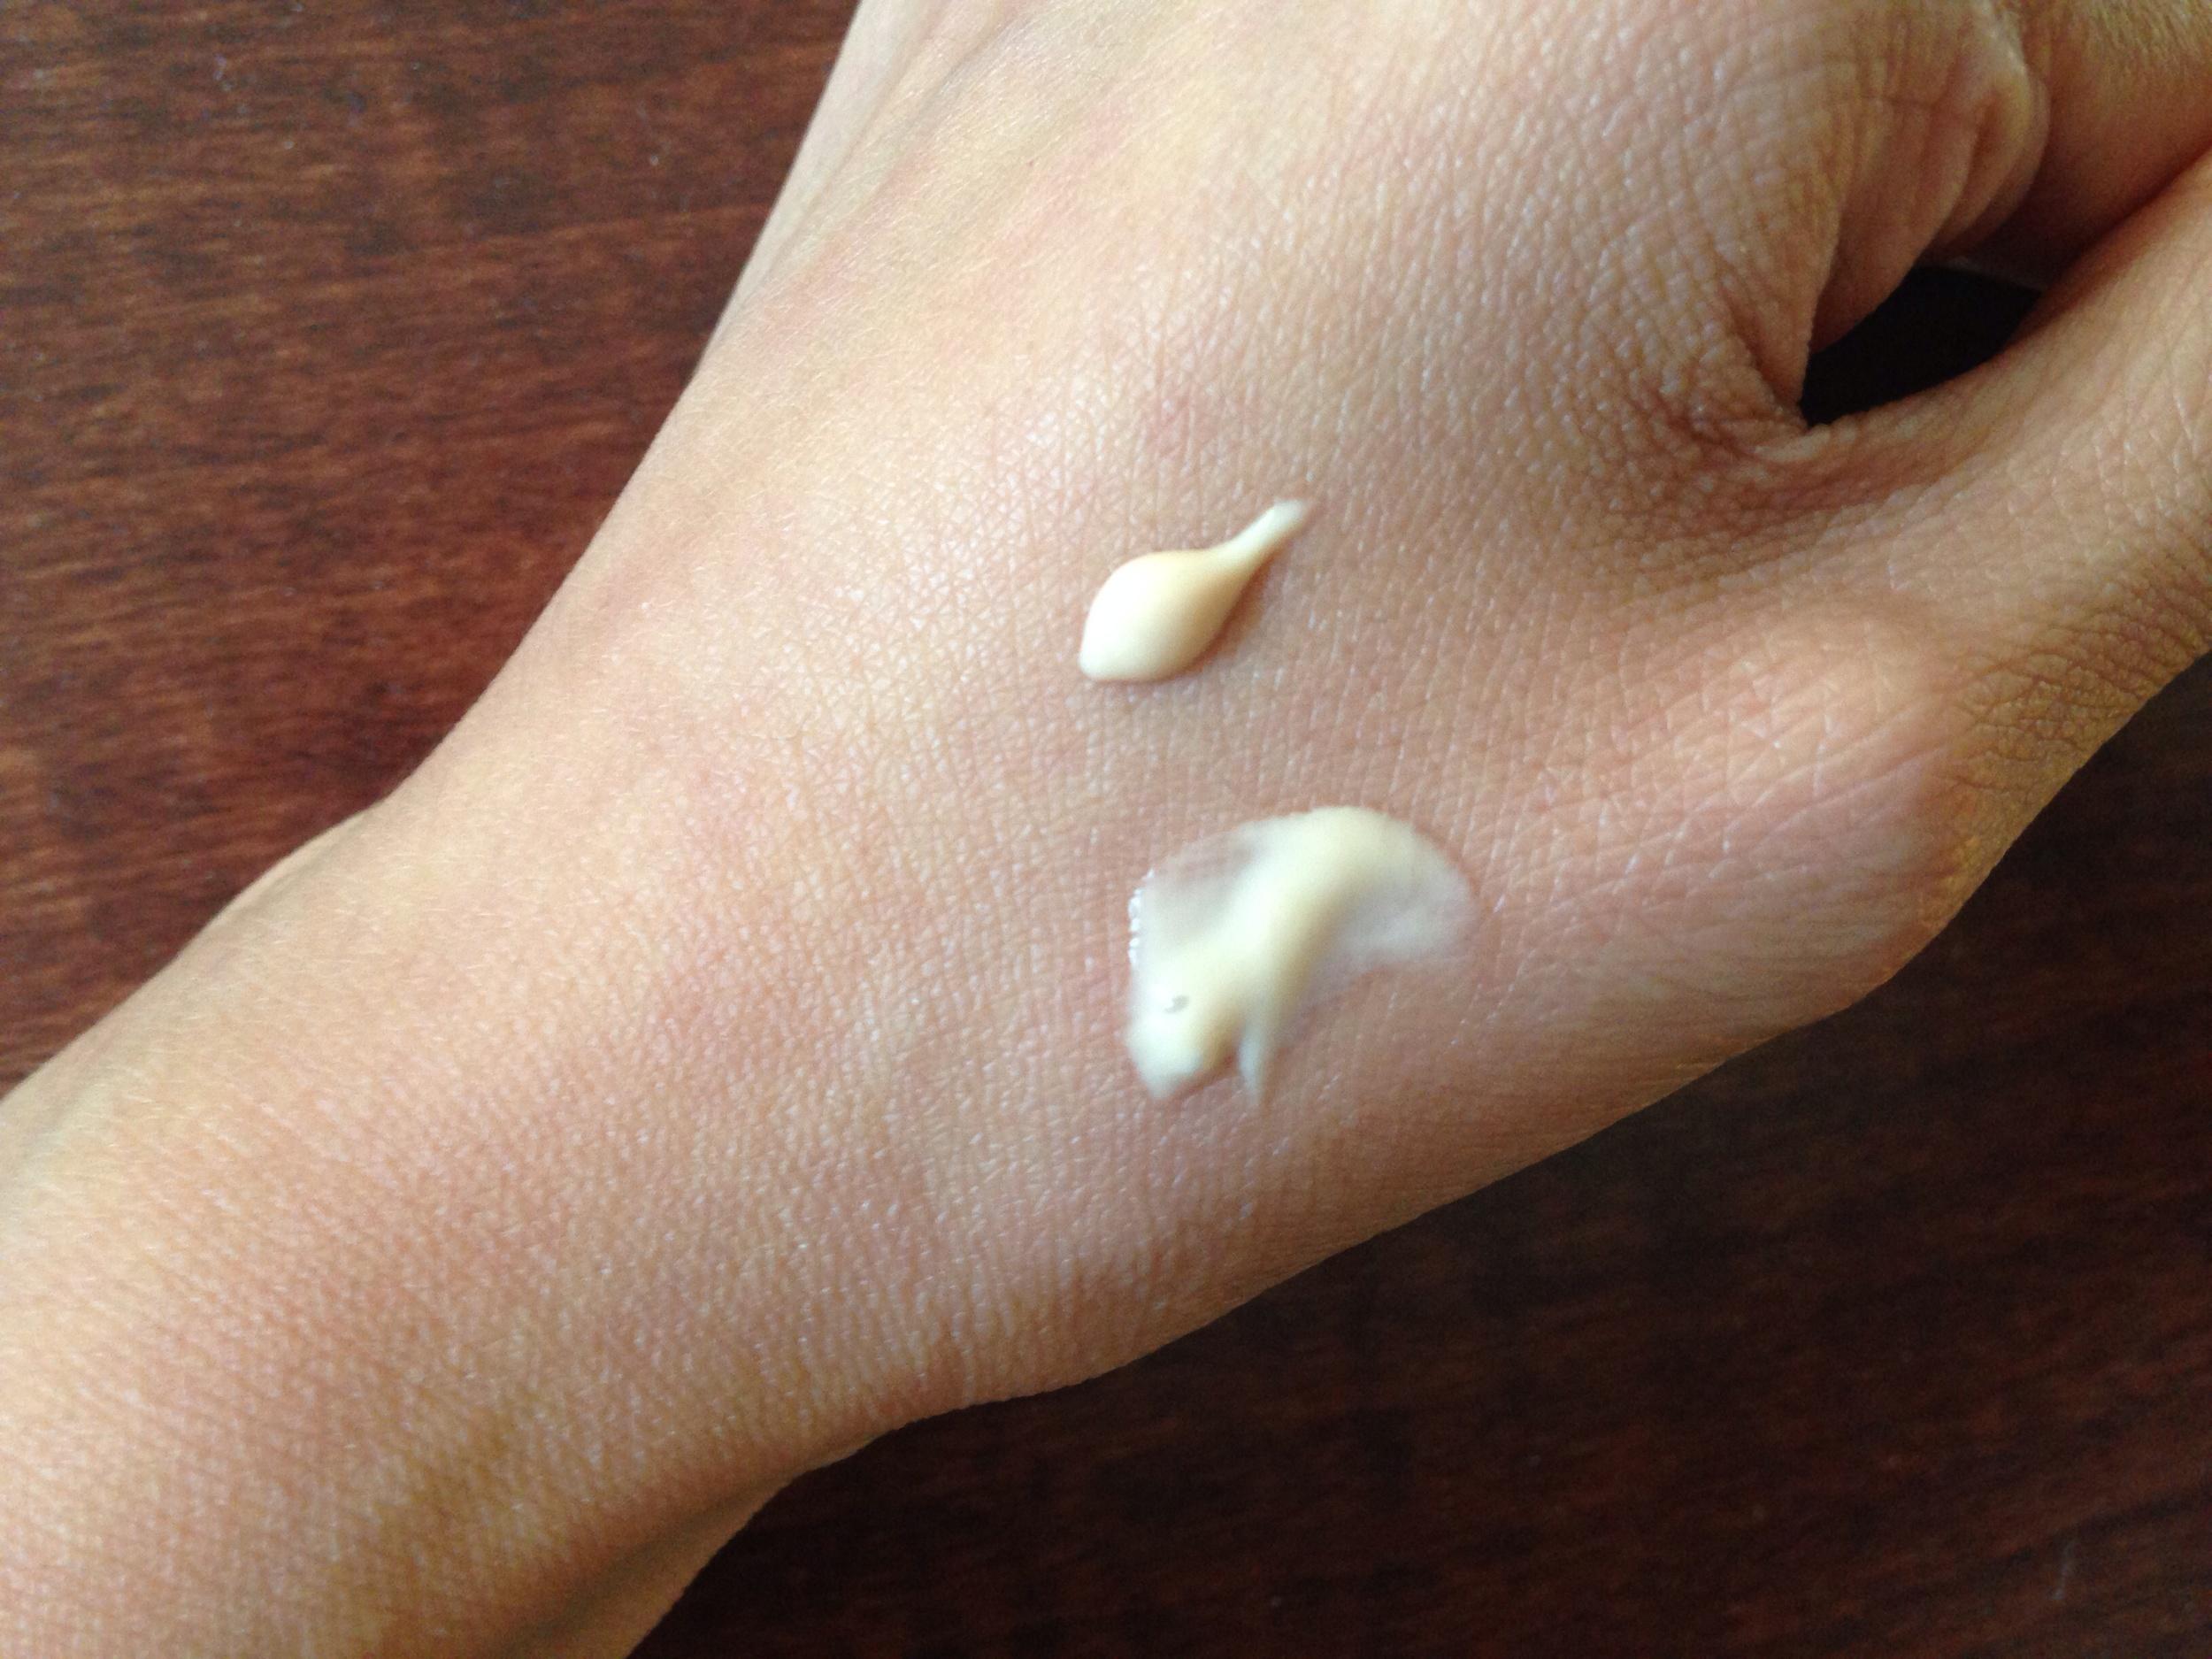 Radical Skincare Advanced Peptide Antioxidant Serum swatch